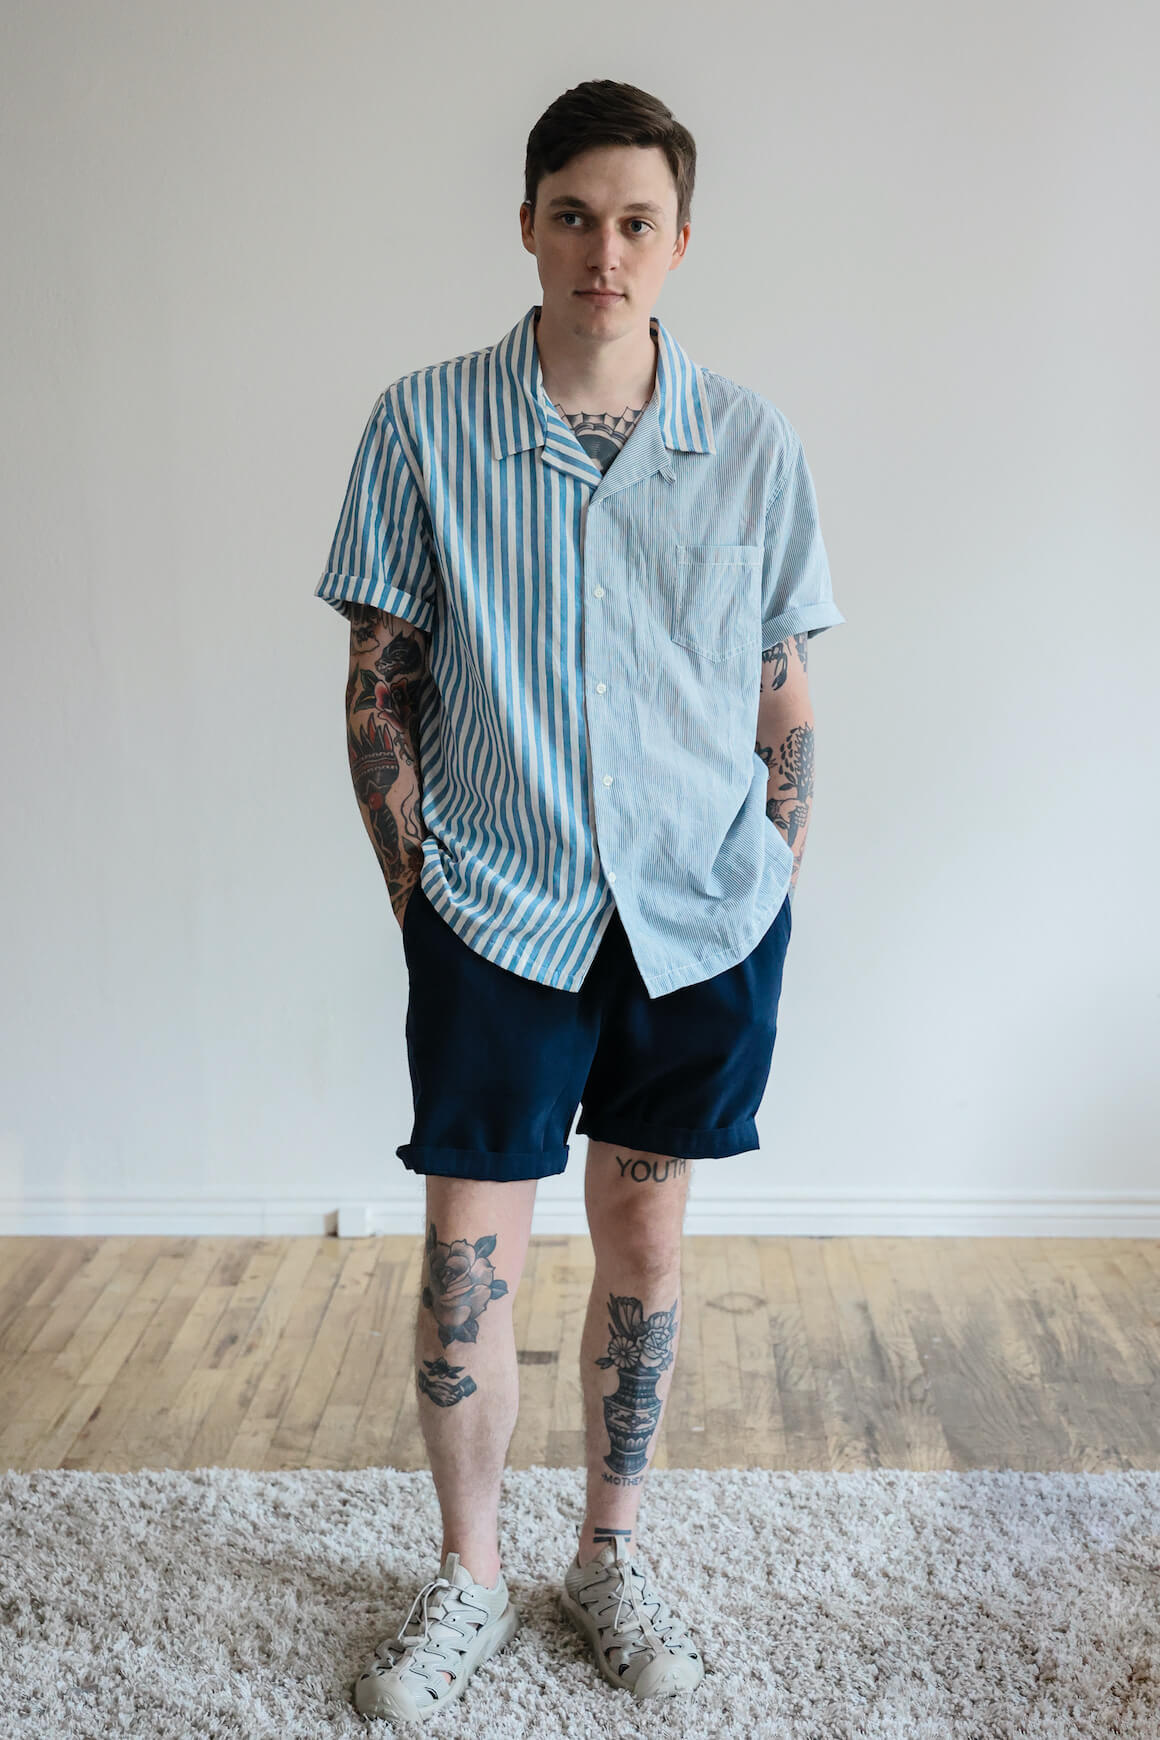 universal works beach shorts, howlin synth pop shirt, and hoka one one hopara shoes on body